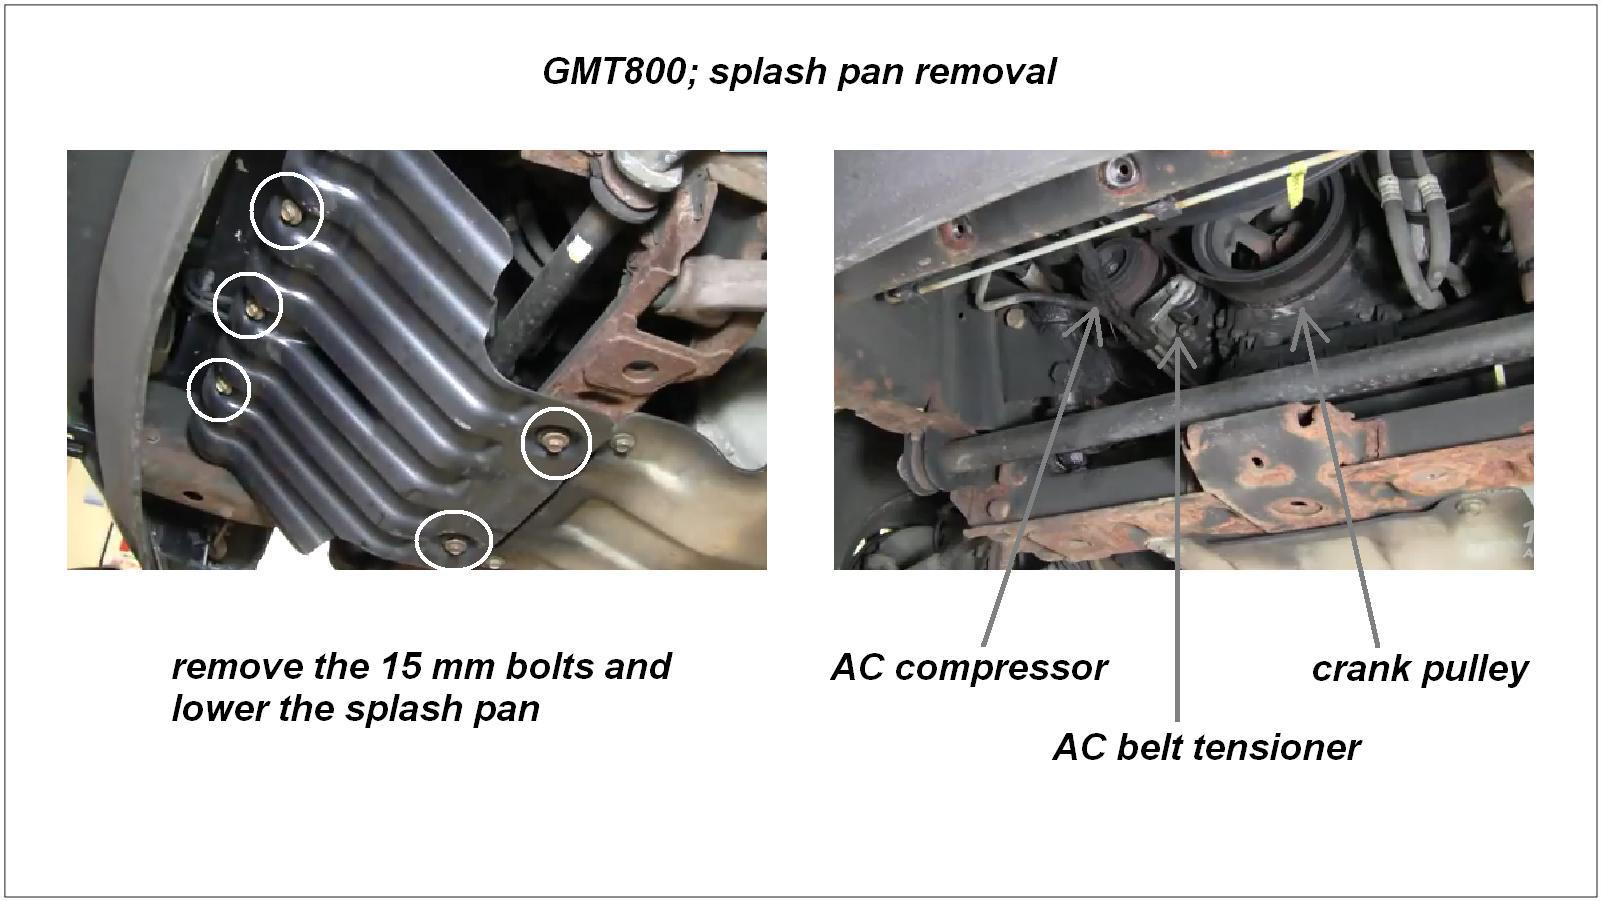 Chevrolet Silverado 1999-2006 GMT800 How to Replace A/C Belt